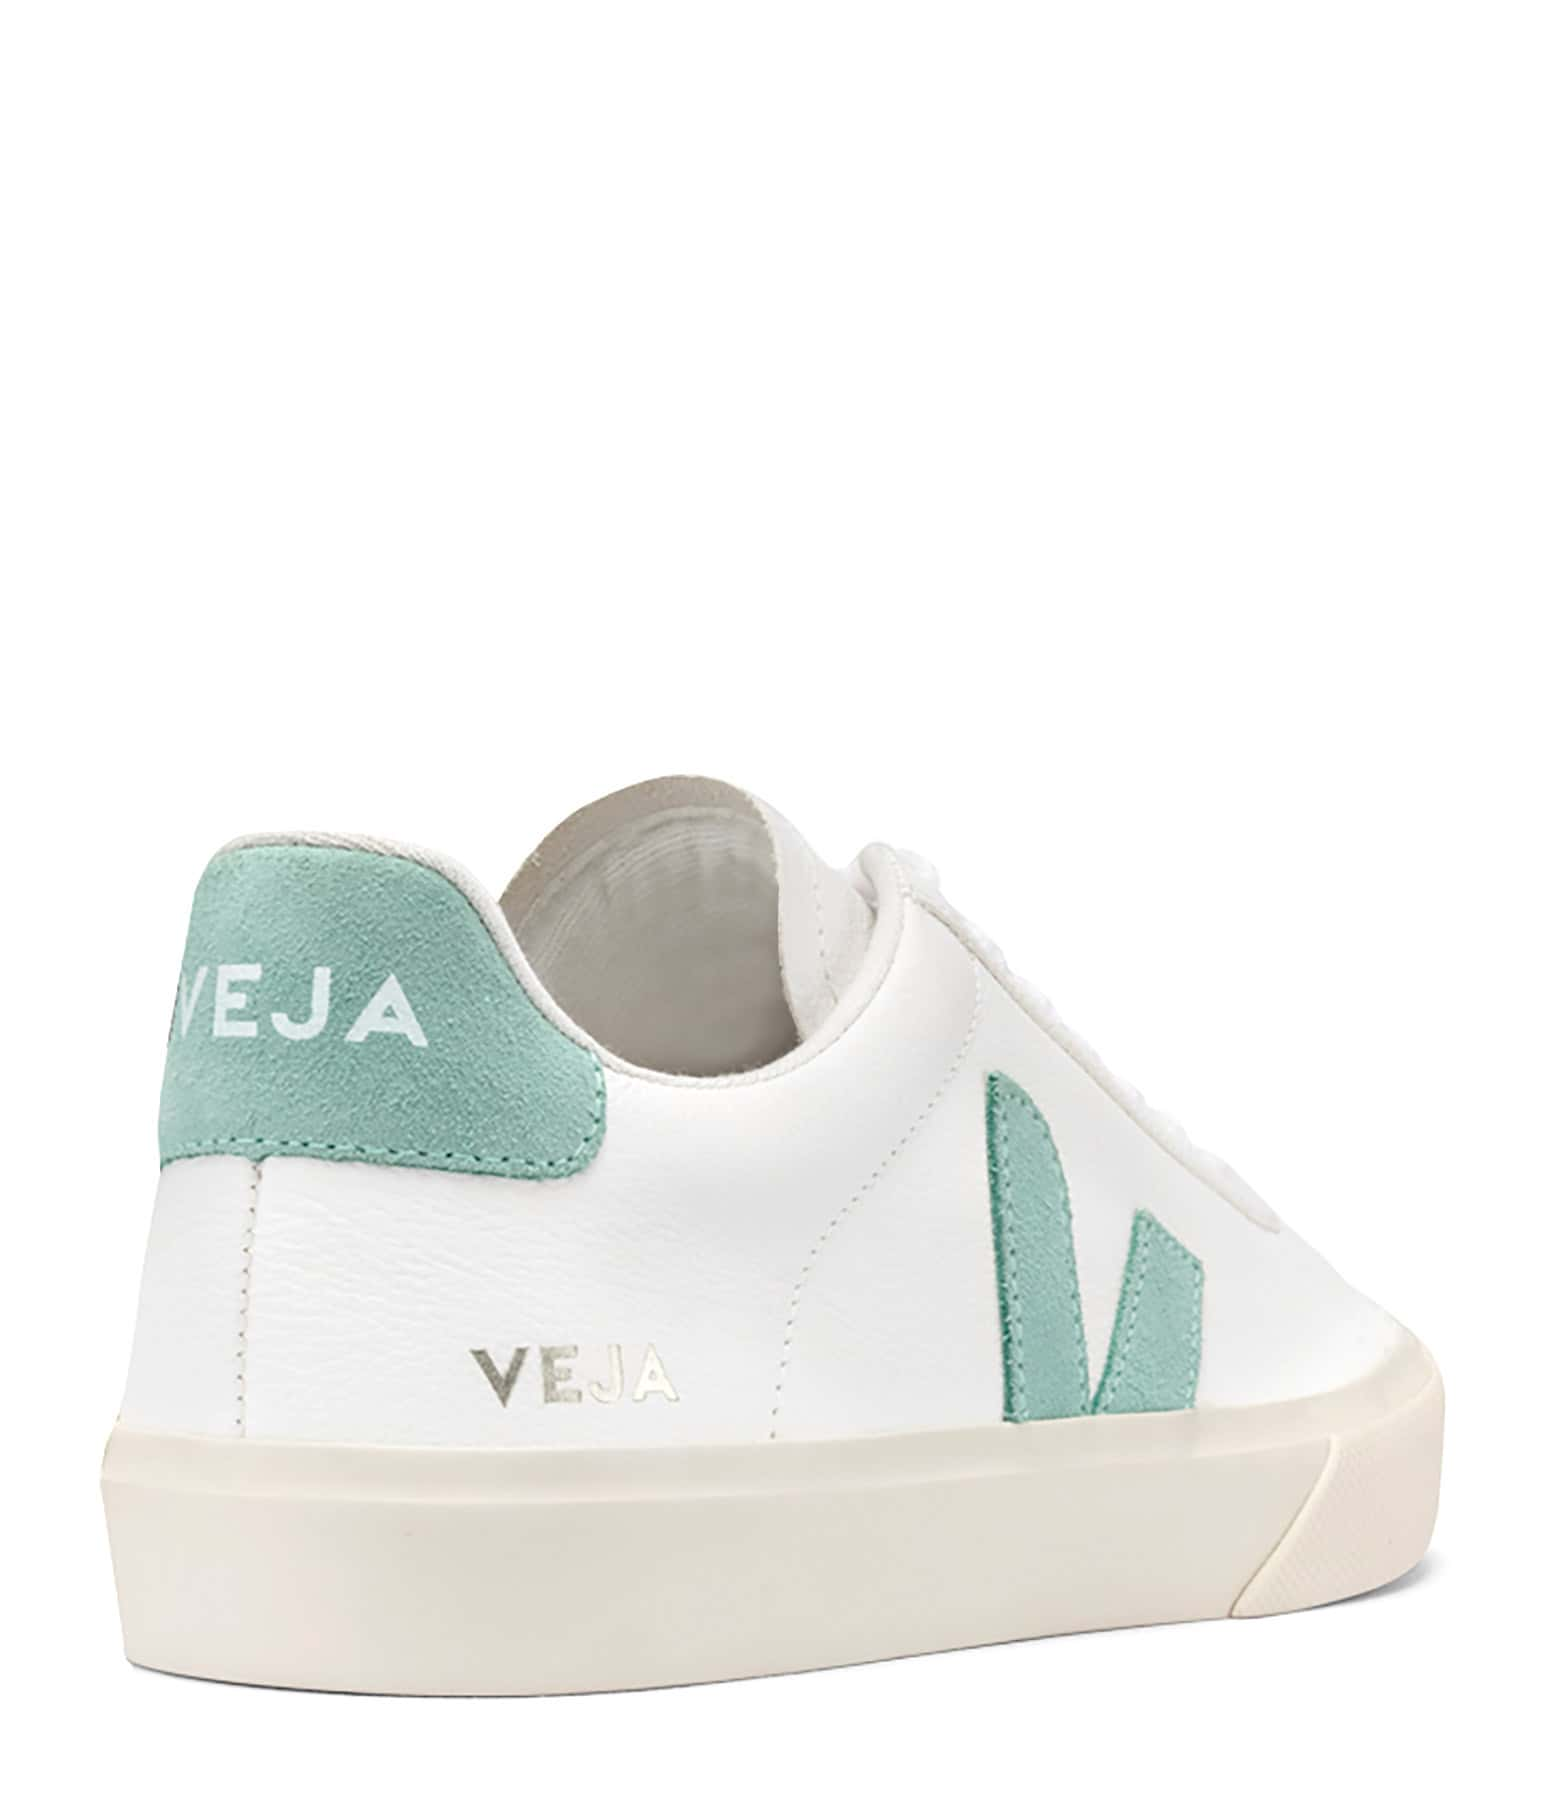 VEJA - Baskets Campo Chromefree Extra White Matcha